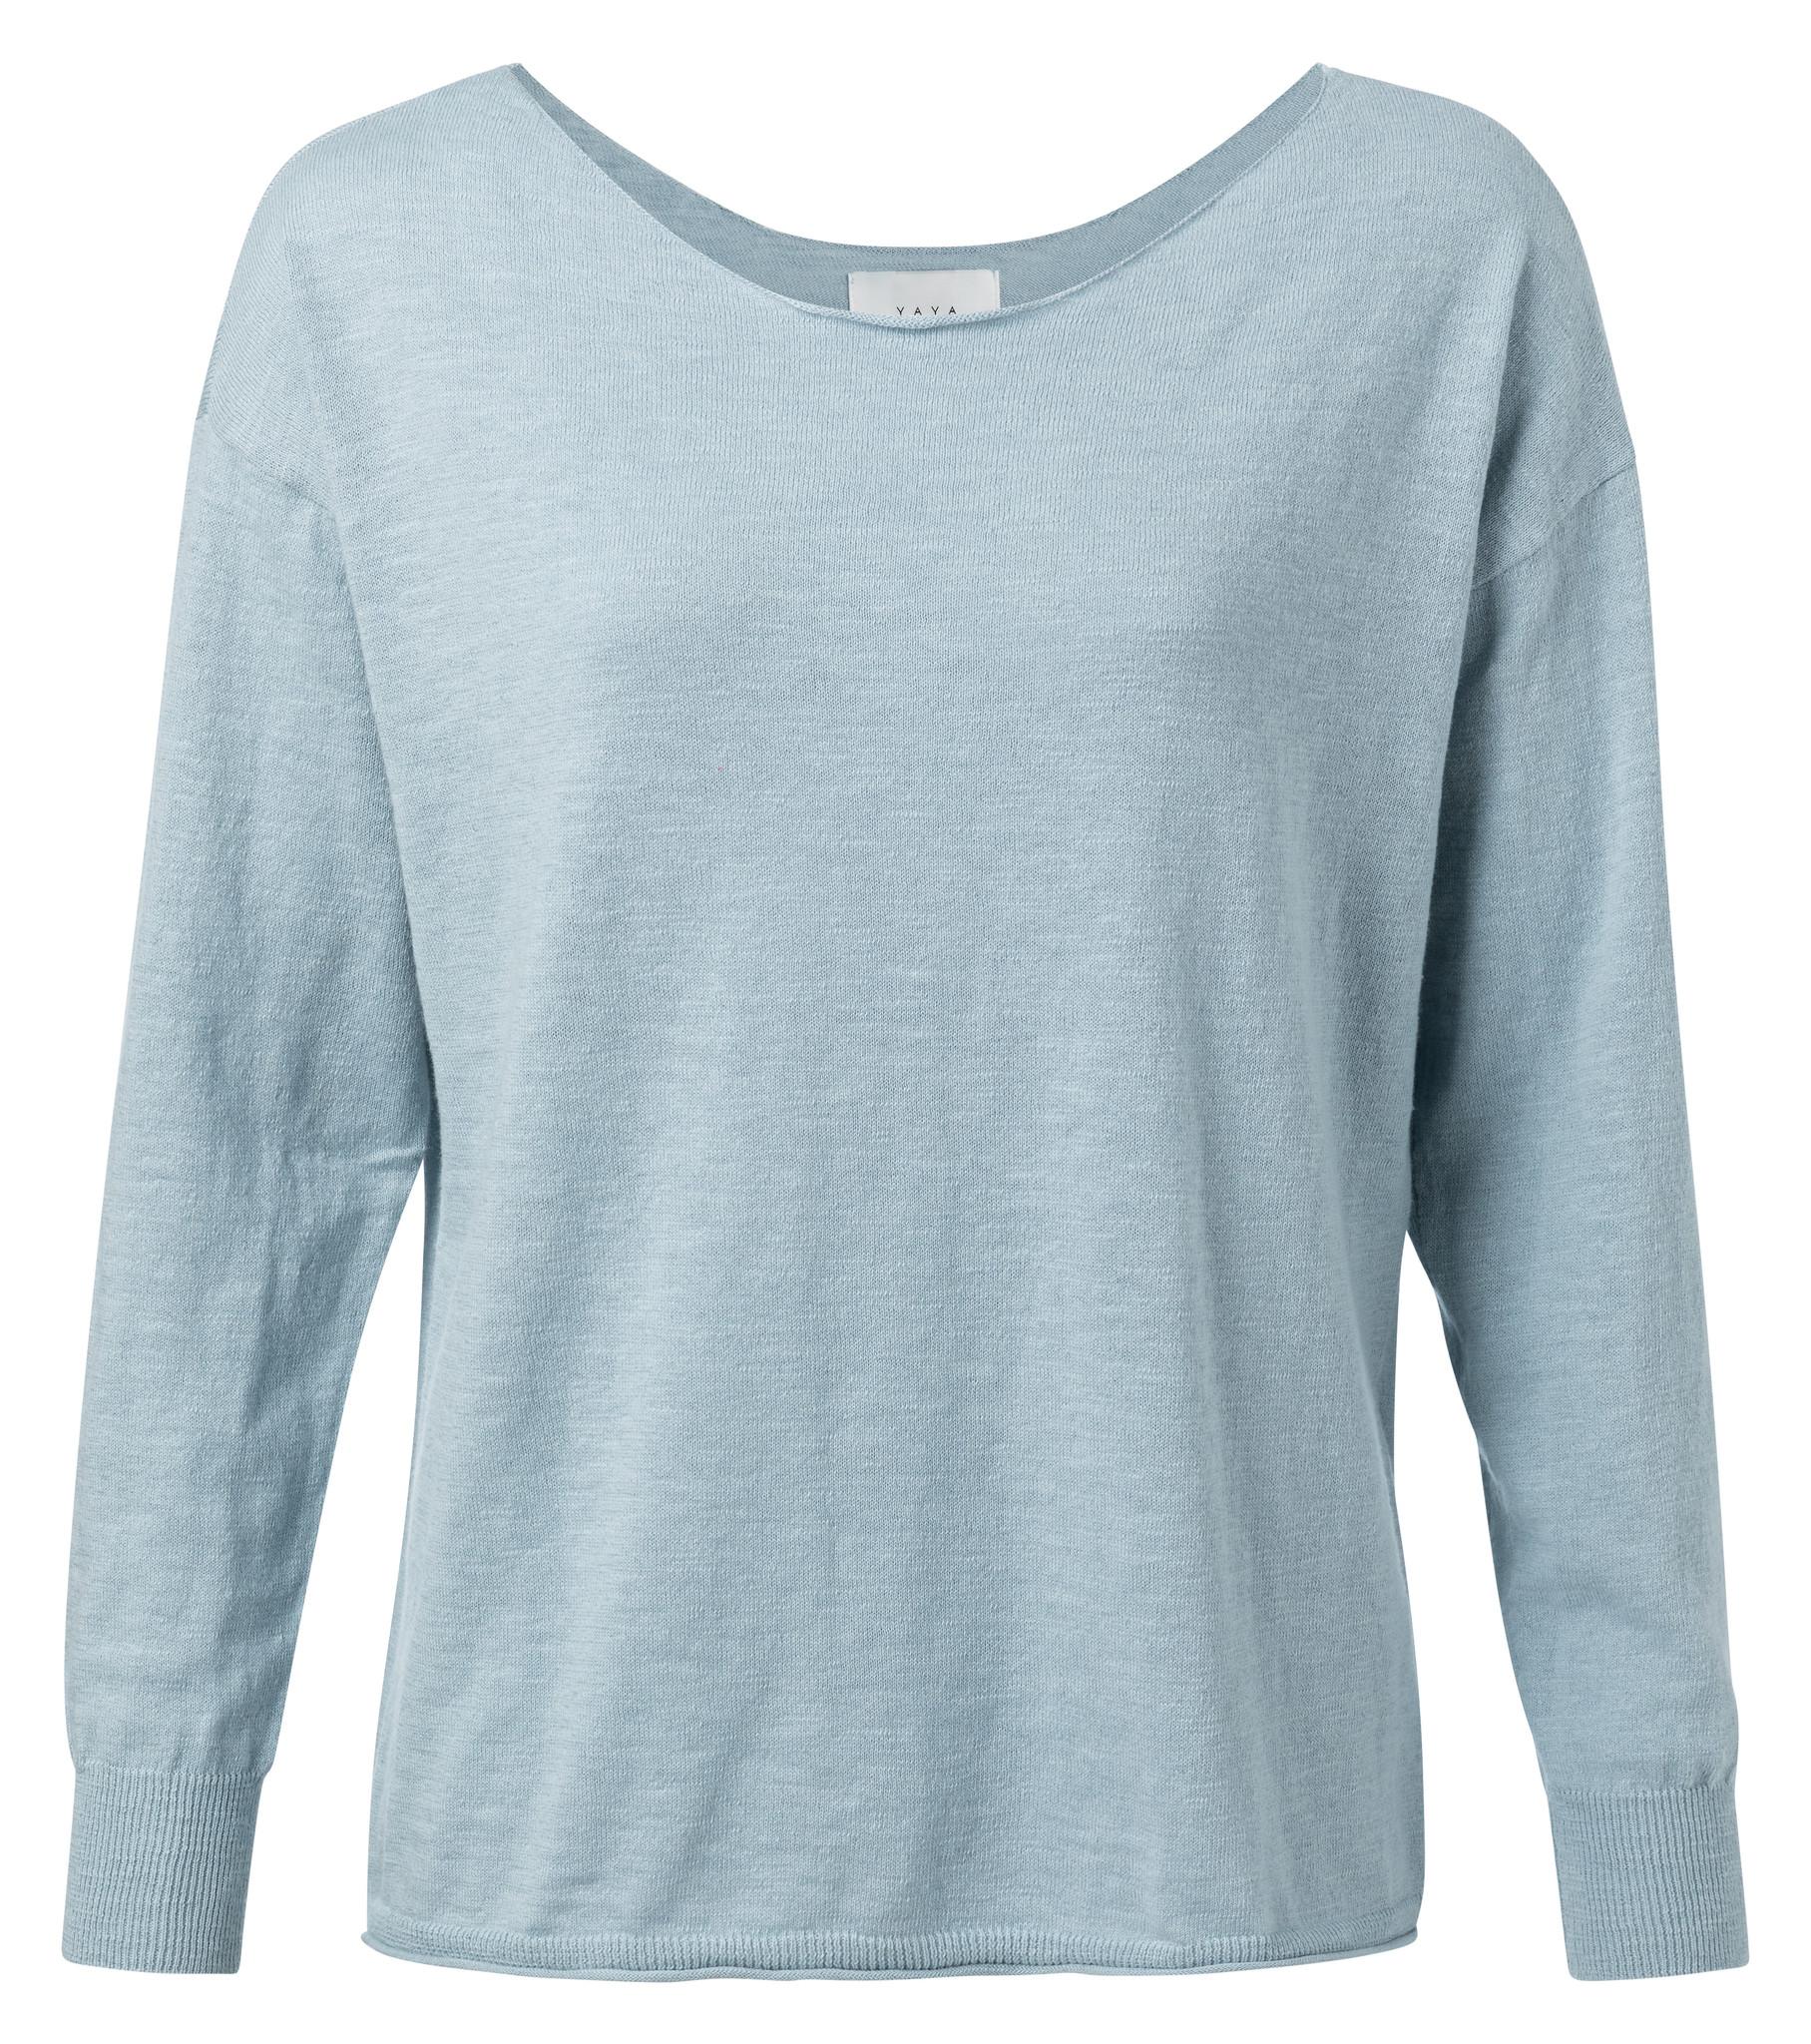 yaya Cotton cashmere blen 1000289-014-1